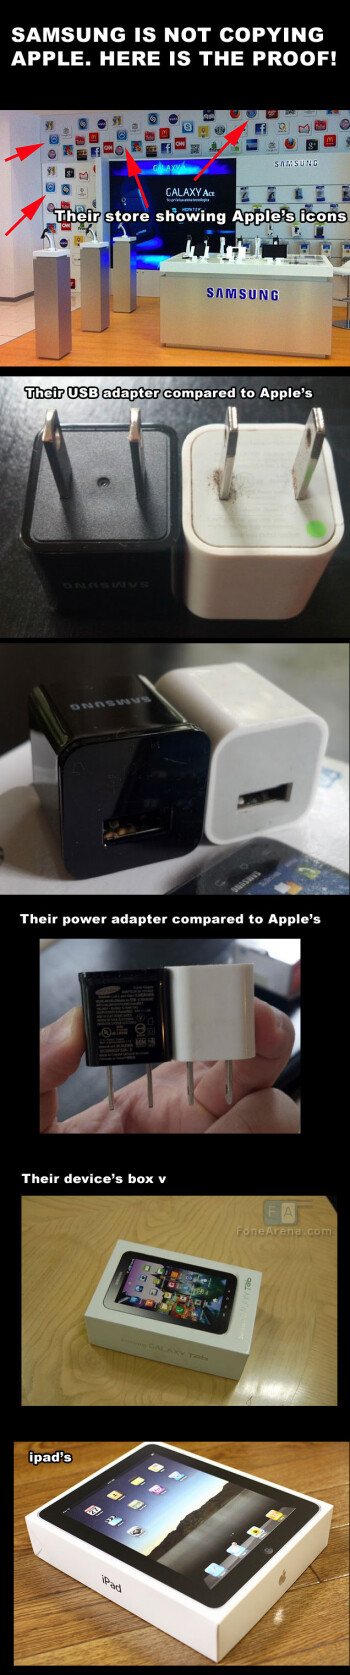 Here's how Samsung never copies Apple... Not